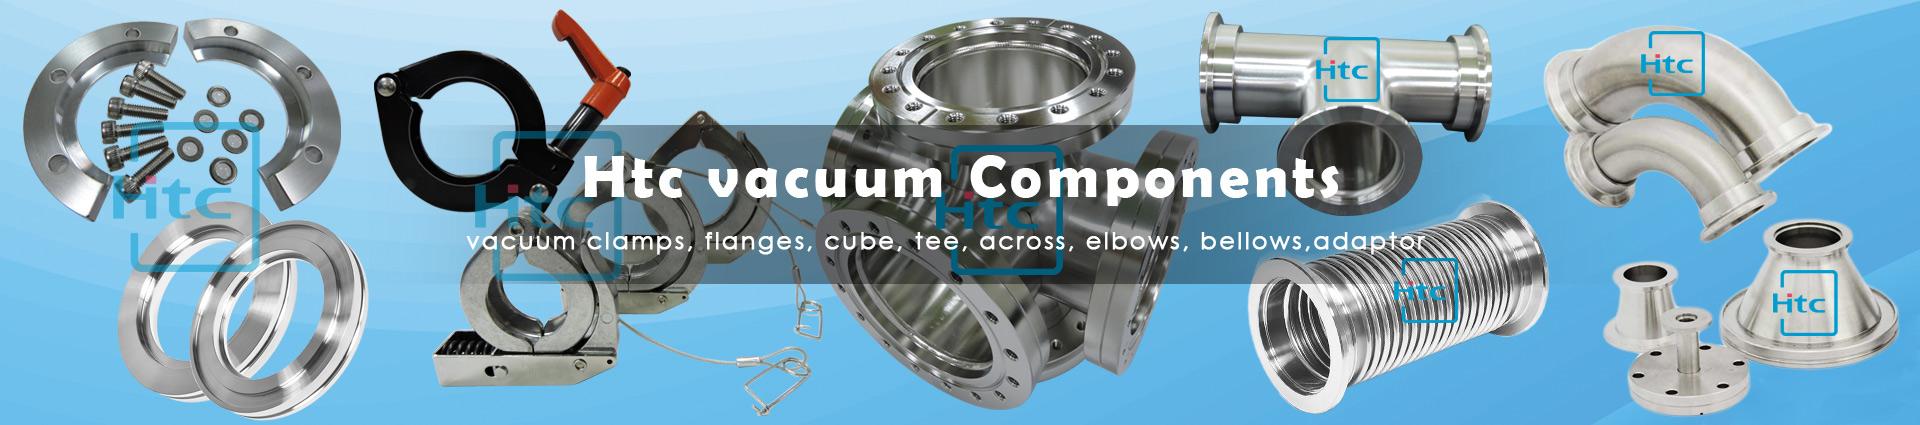 htc-vacuum-components.jpg